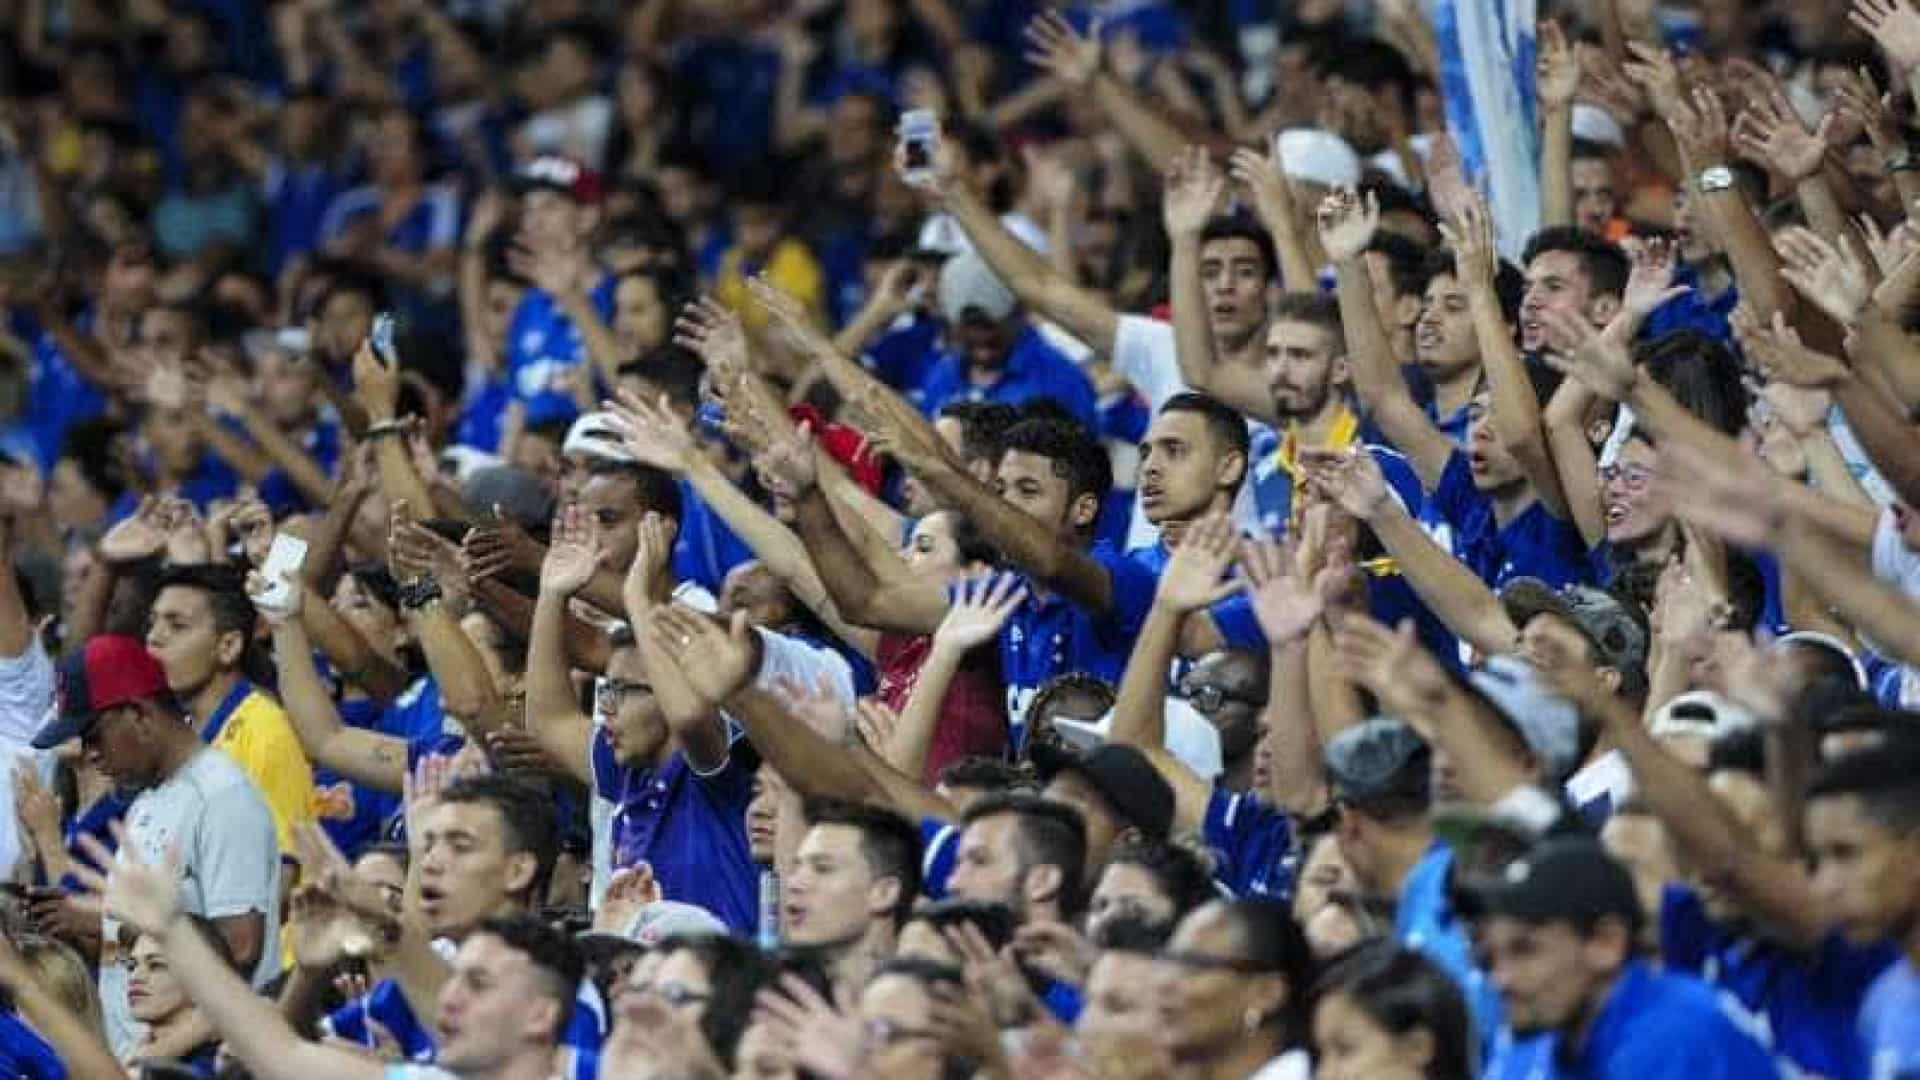 Jovens do Cruzeiro admitem alívio após vaga sofrida na Copa do Brasil